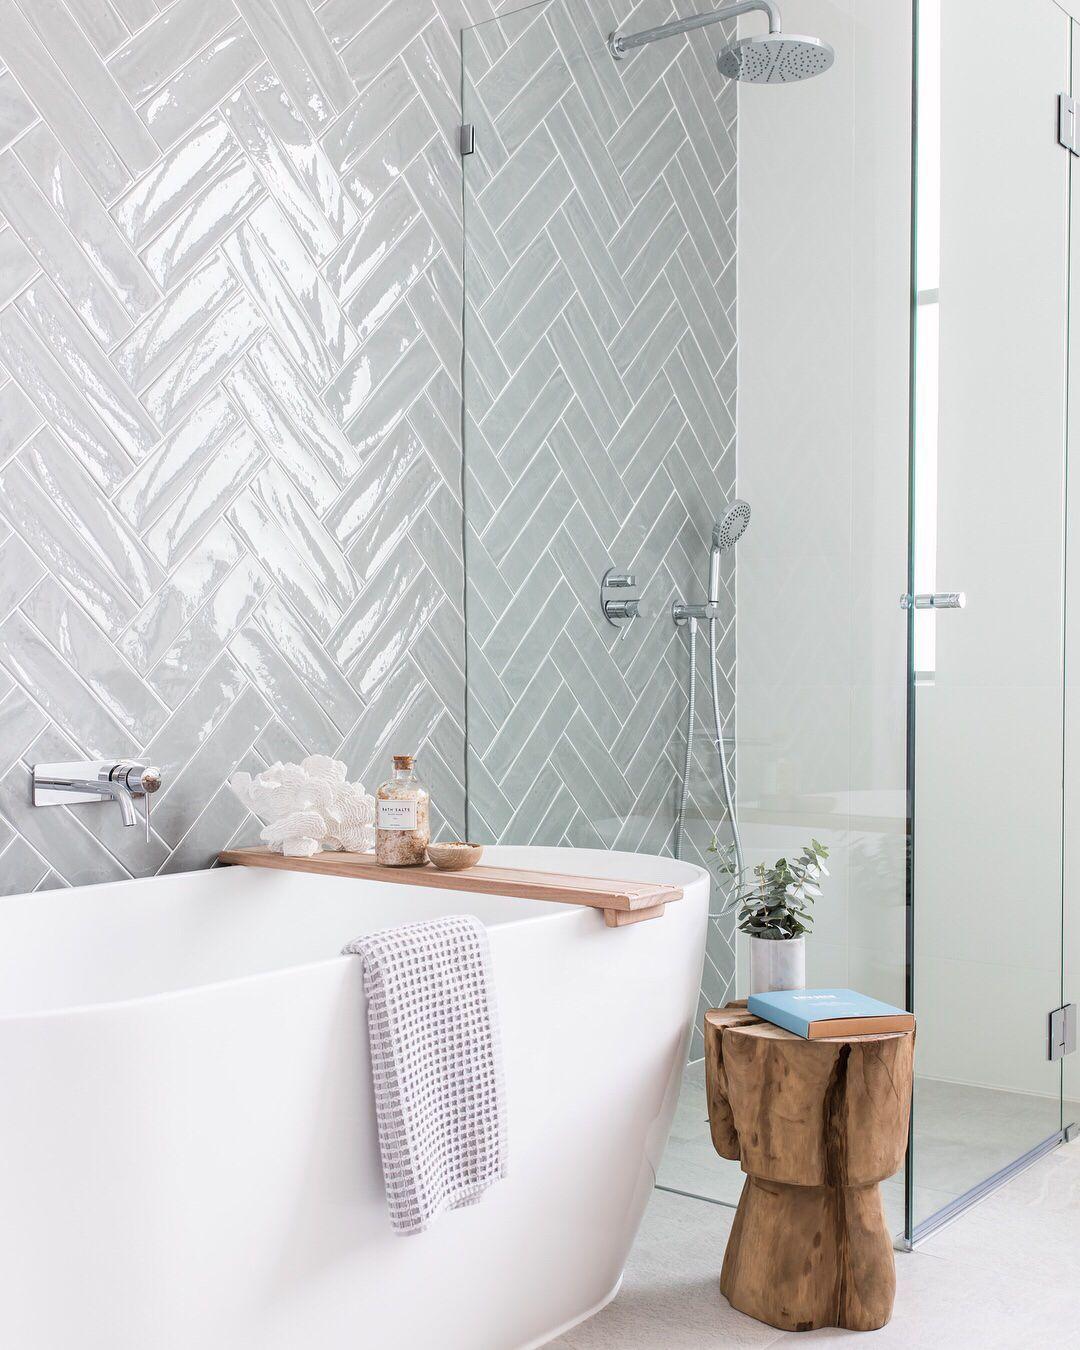 Breathtaking 35 Minimalist Bathroom Design Ideas For Modern Home Decor Http Gurudecor Com 2018 09 Medium Bathroom Ideas Laundry In Bathroom Classic Bathroom